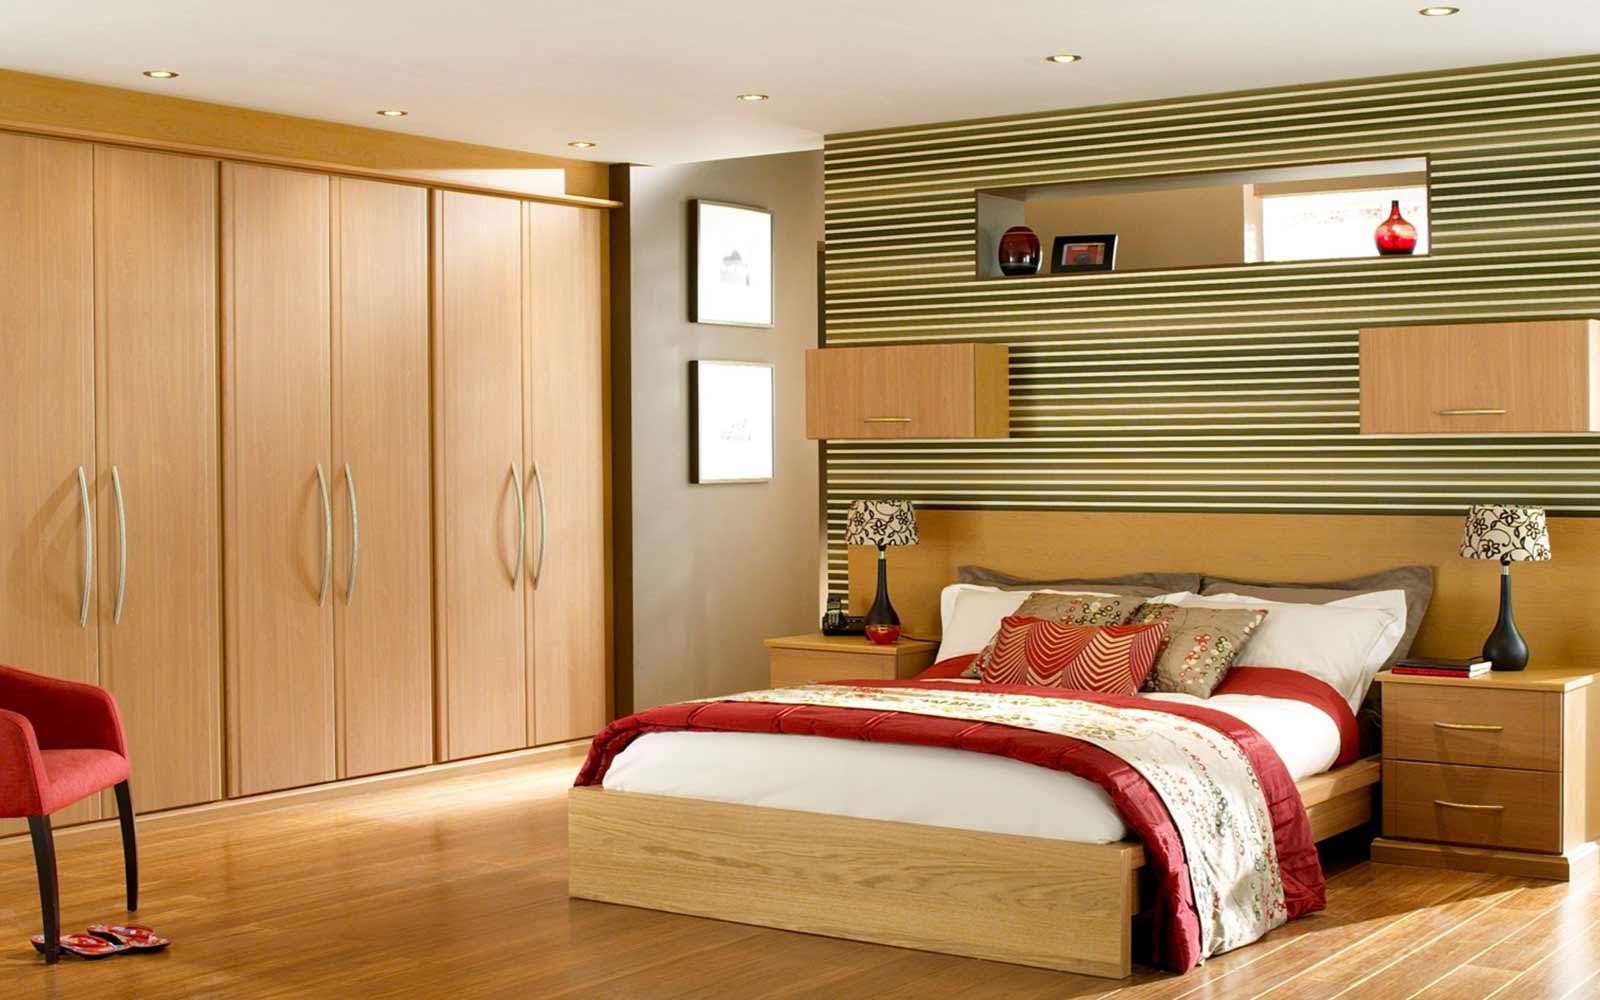 Bedroom Designs India - Bedroom | Bedroom Designs | Indian ...